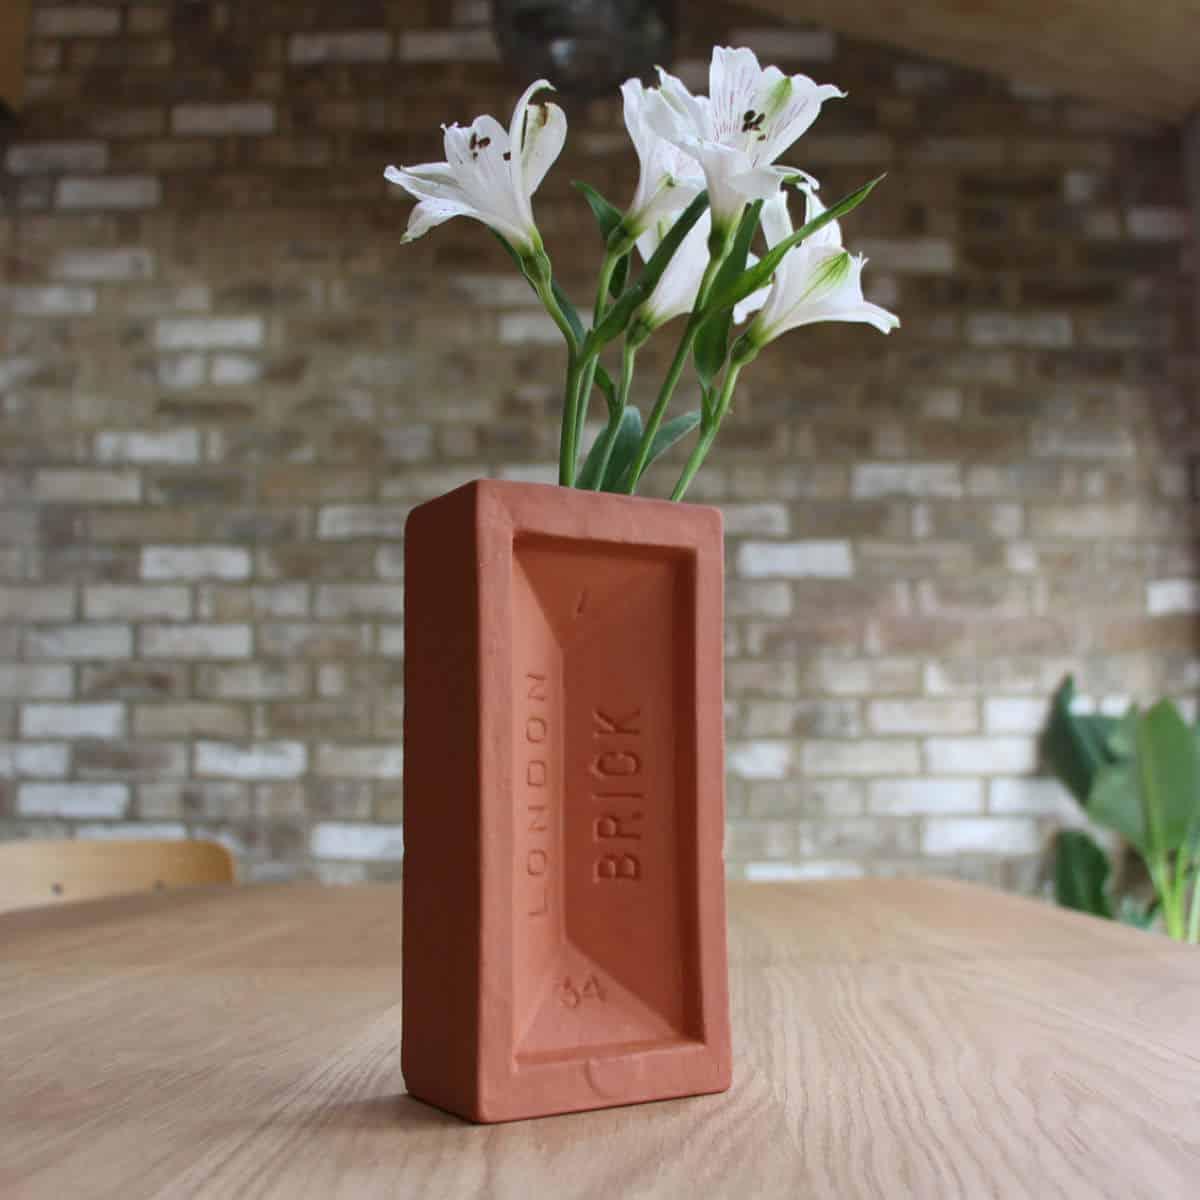 Terracotta brick vase in situ